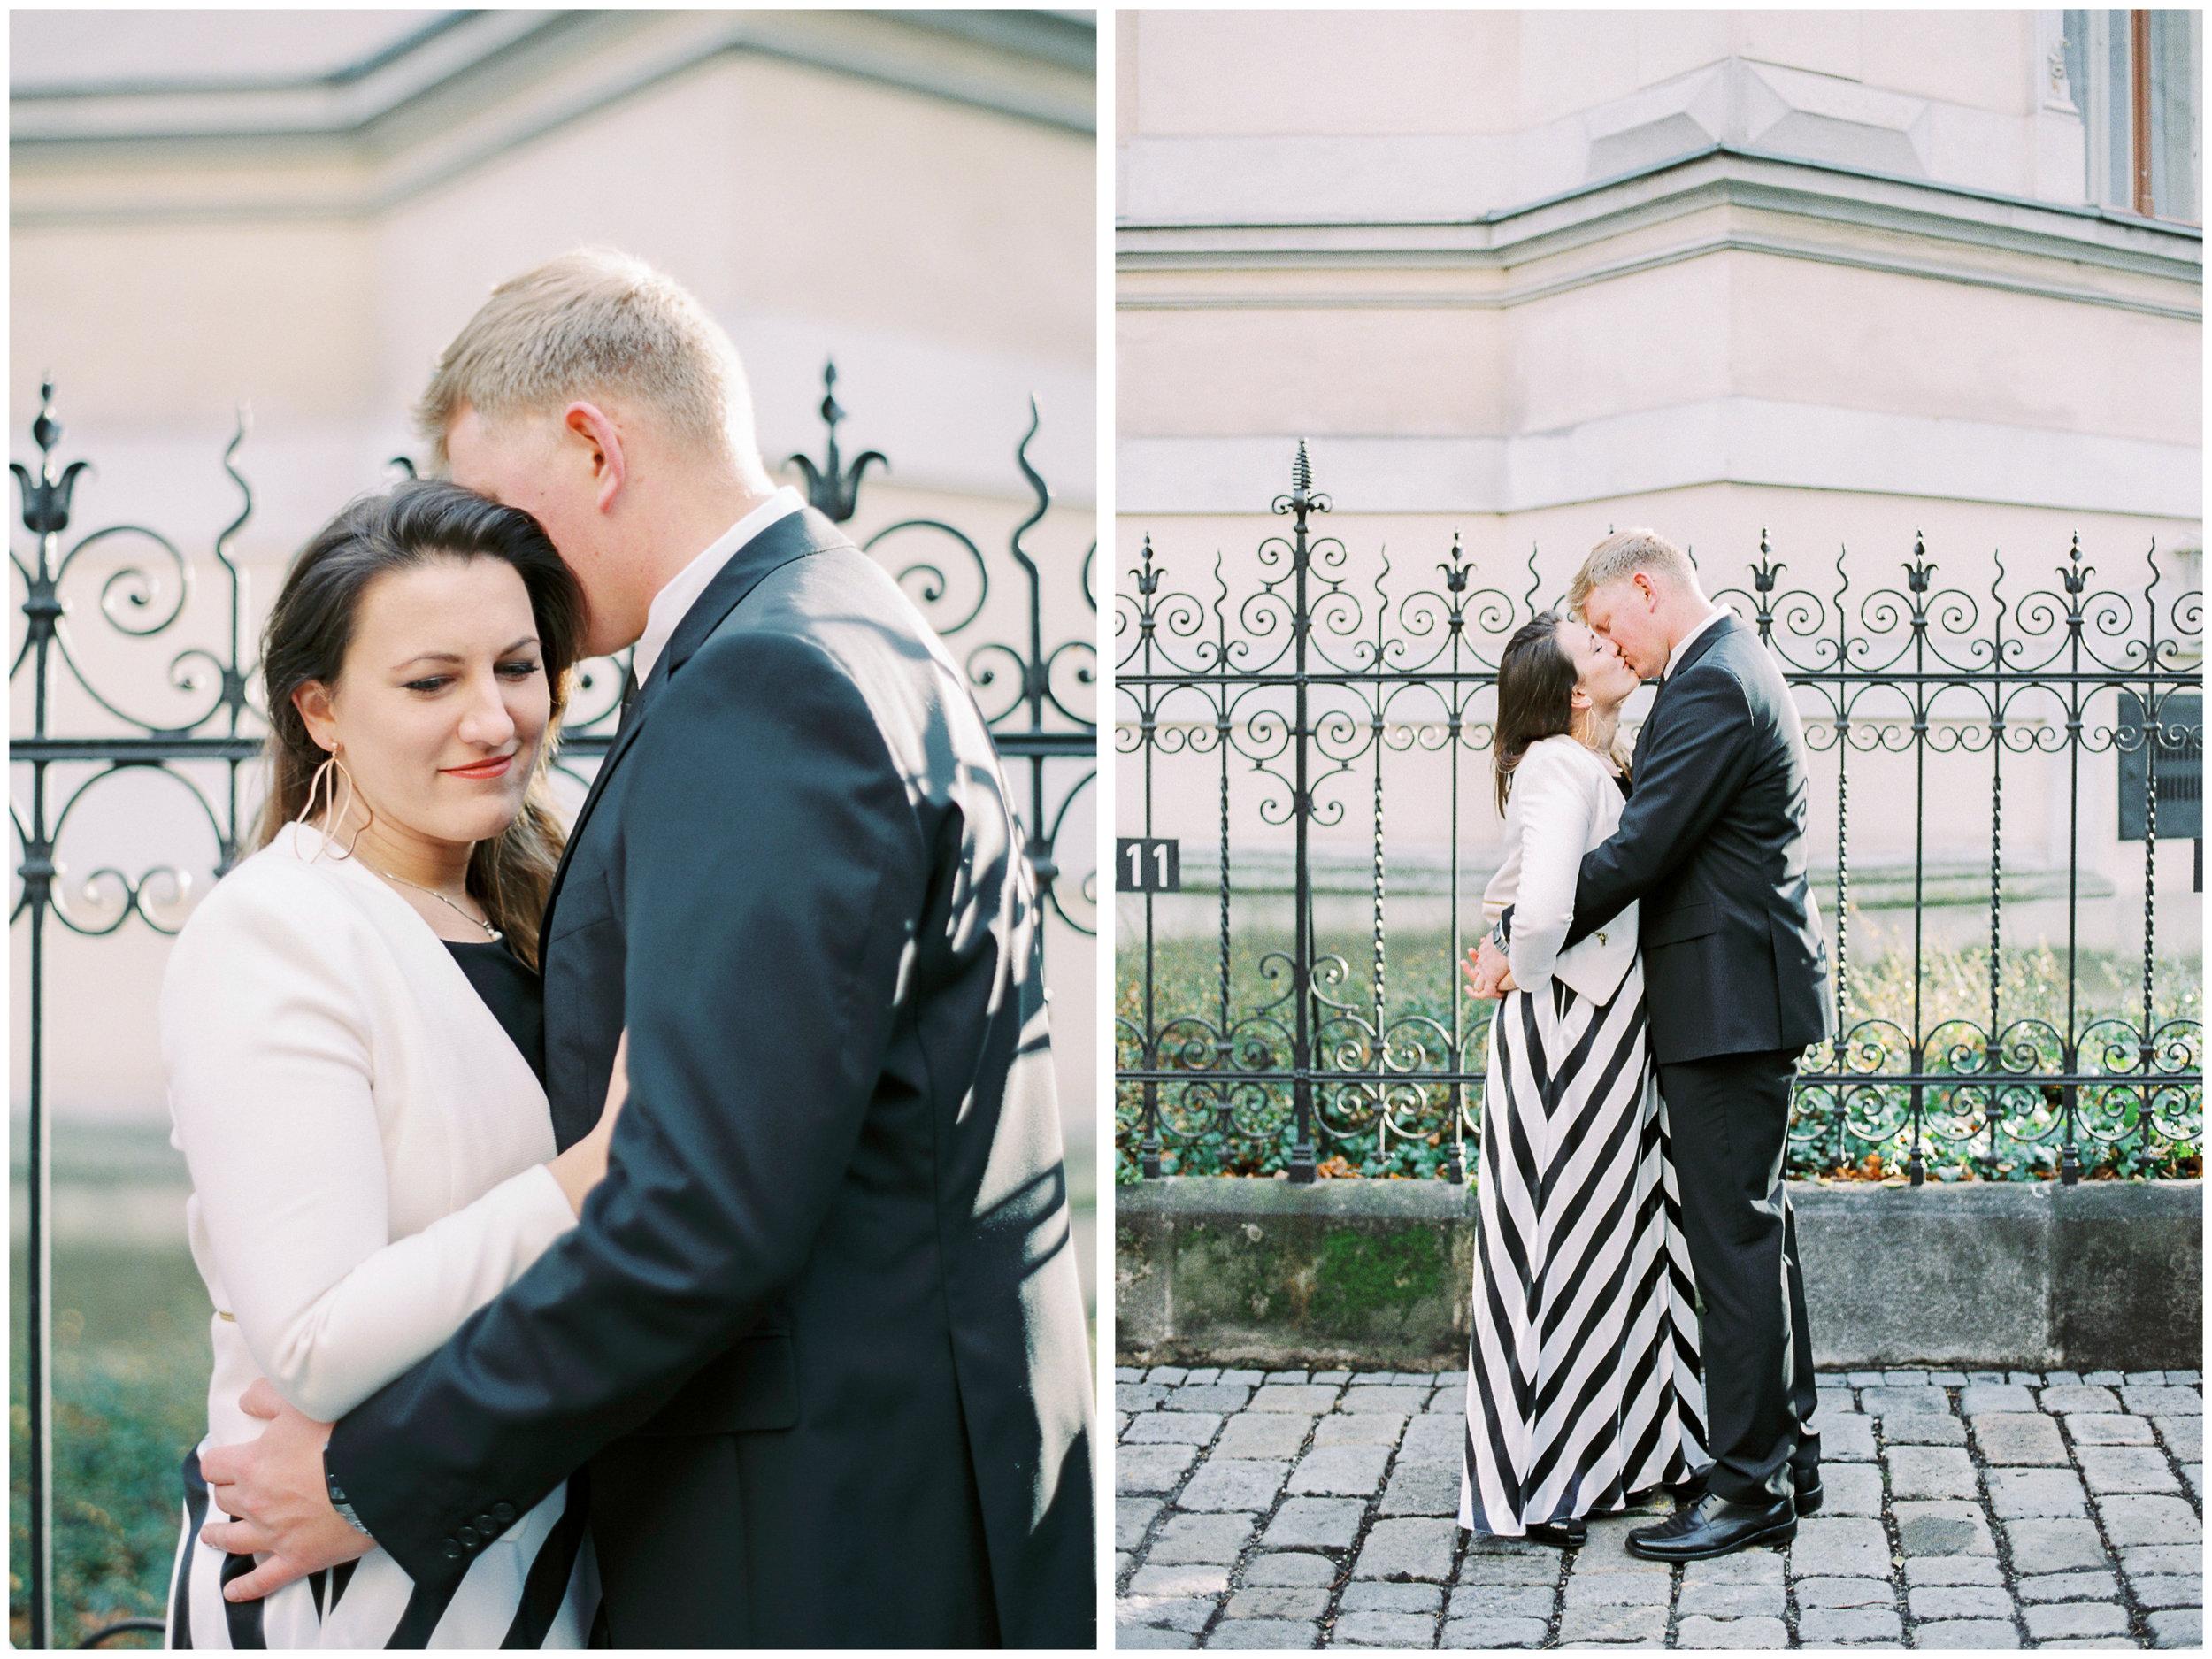 Courthouse Wedding Photos | Vienna, Austria | Fuji400H | Contax645 | Vienna Film Photographer | Michelle Mock Photography